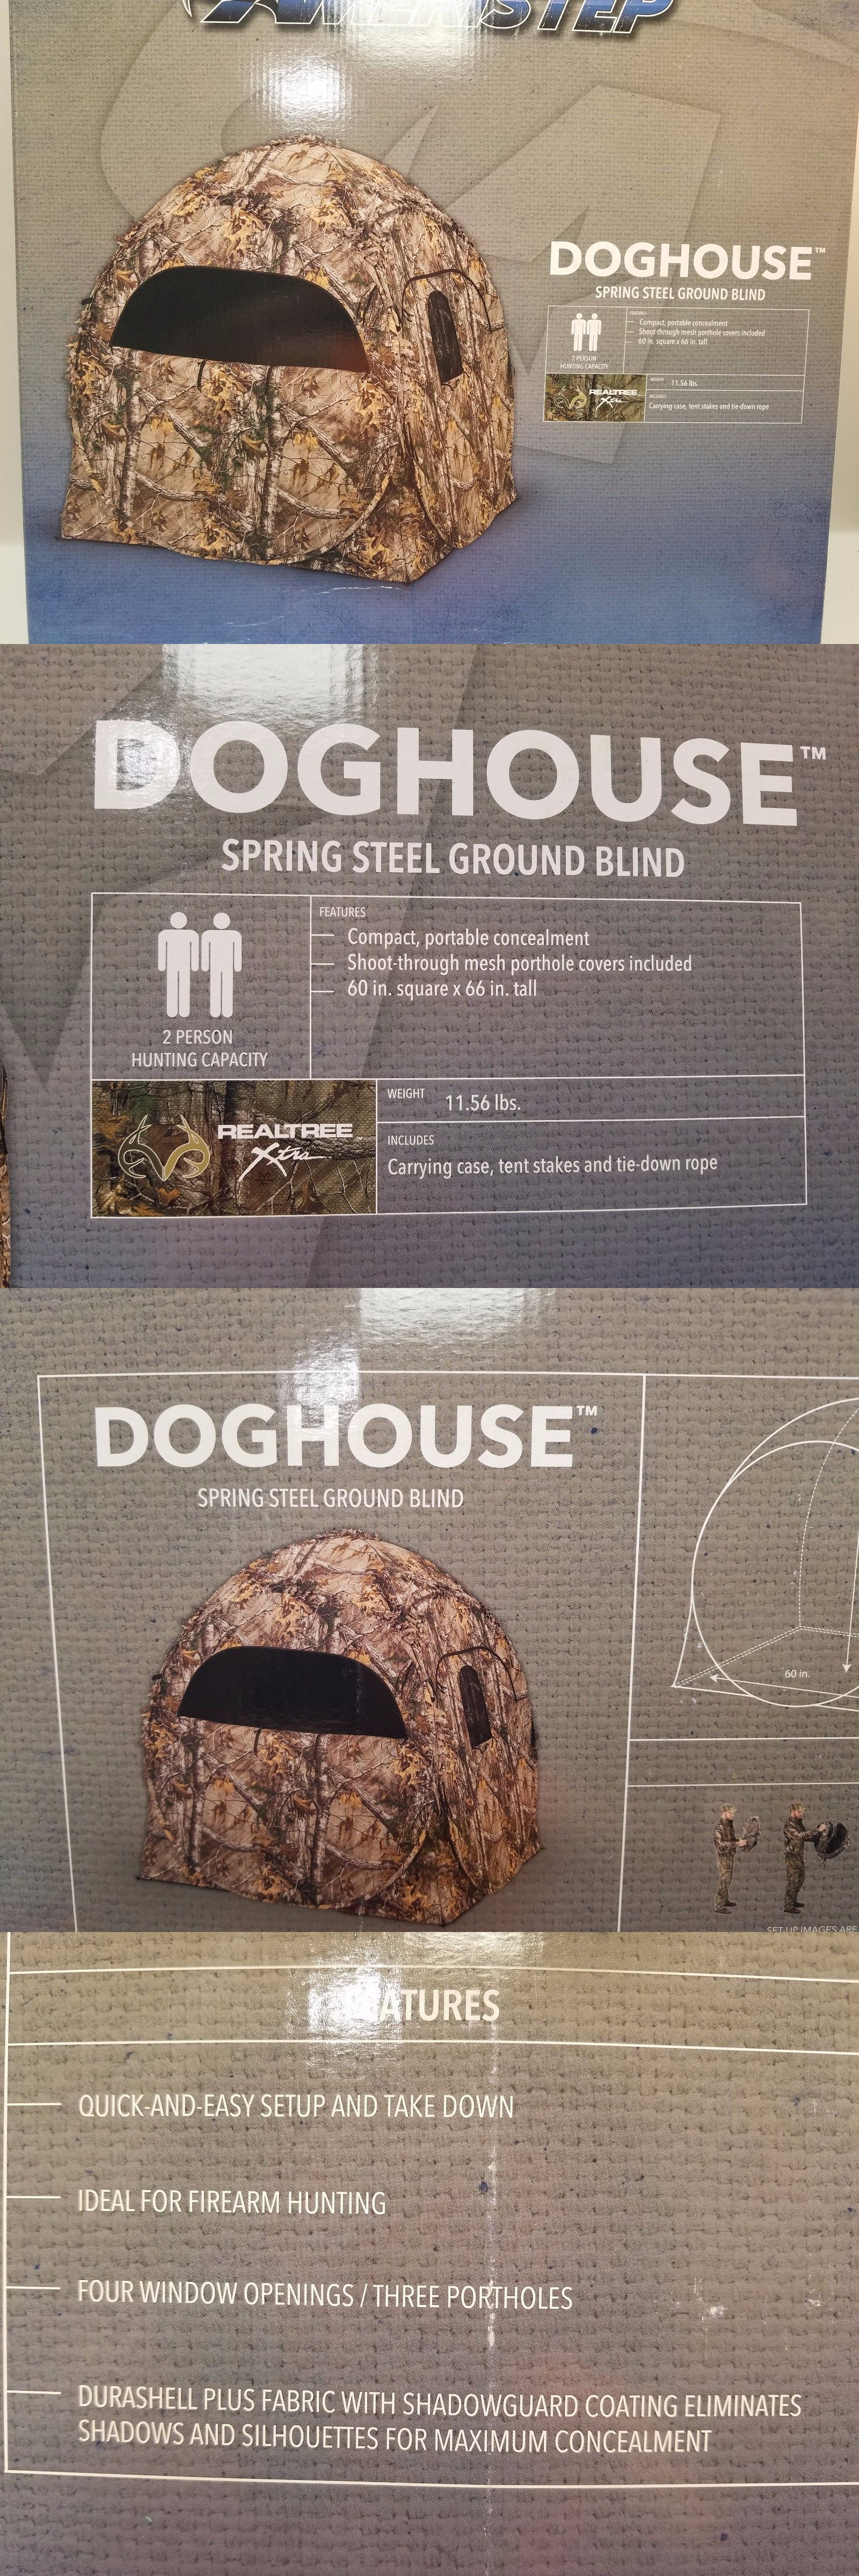 ip walmart ground brickhouse blind blinds com person